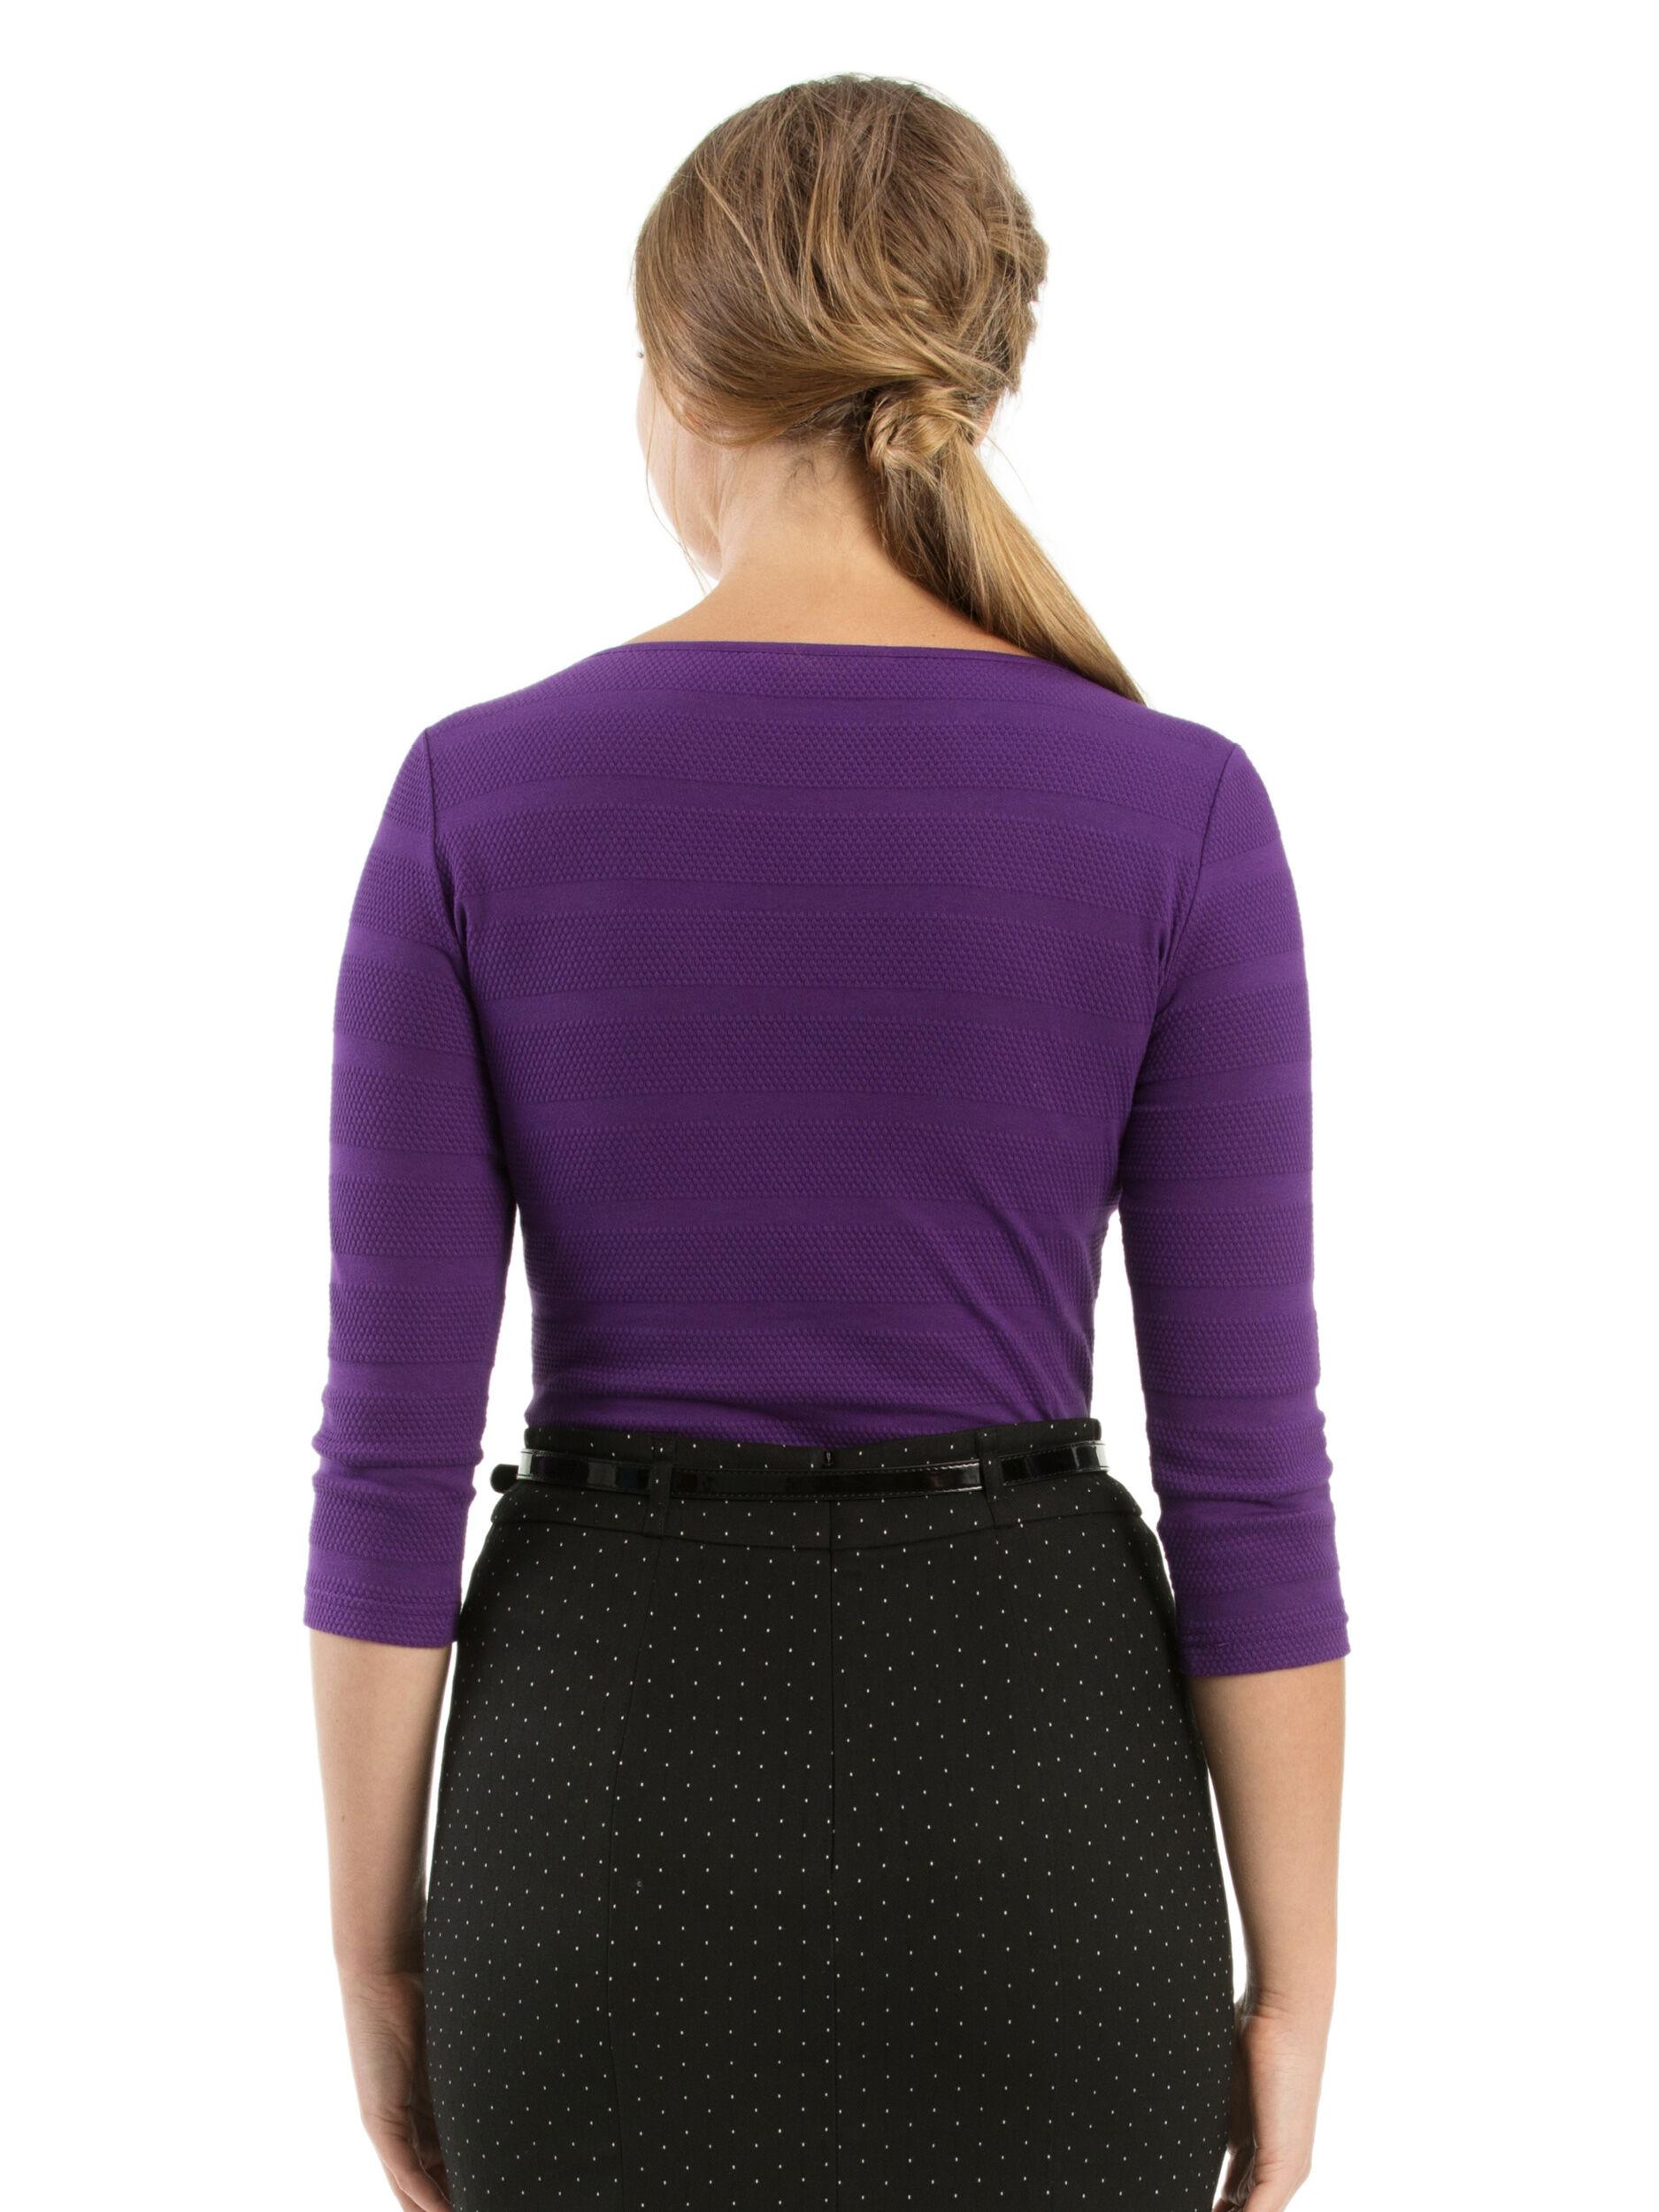 Louise 3/4 Sleeve Top